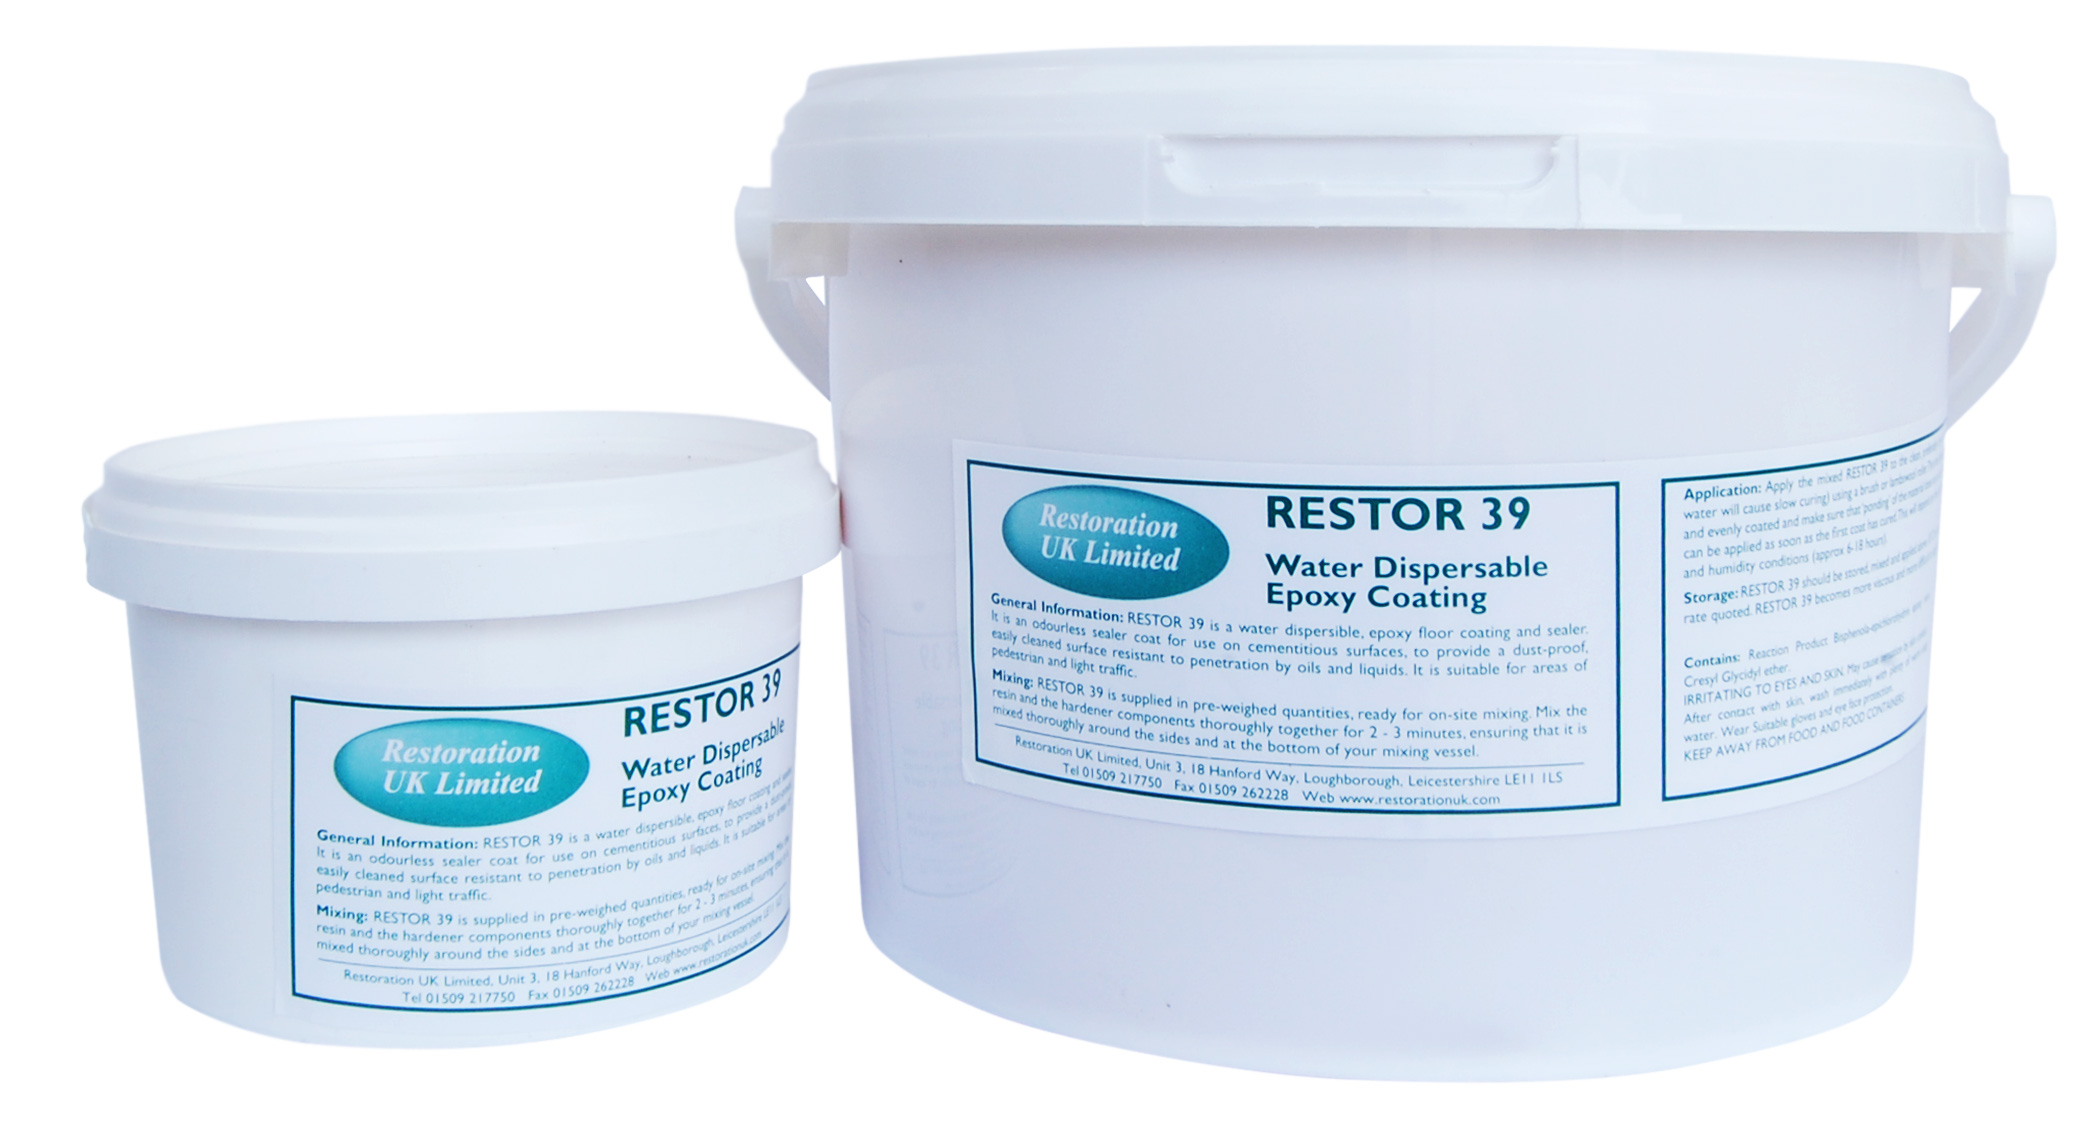 RUK Restor 39 Epoxy Resin Concrete Sealer & Floor Coating